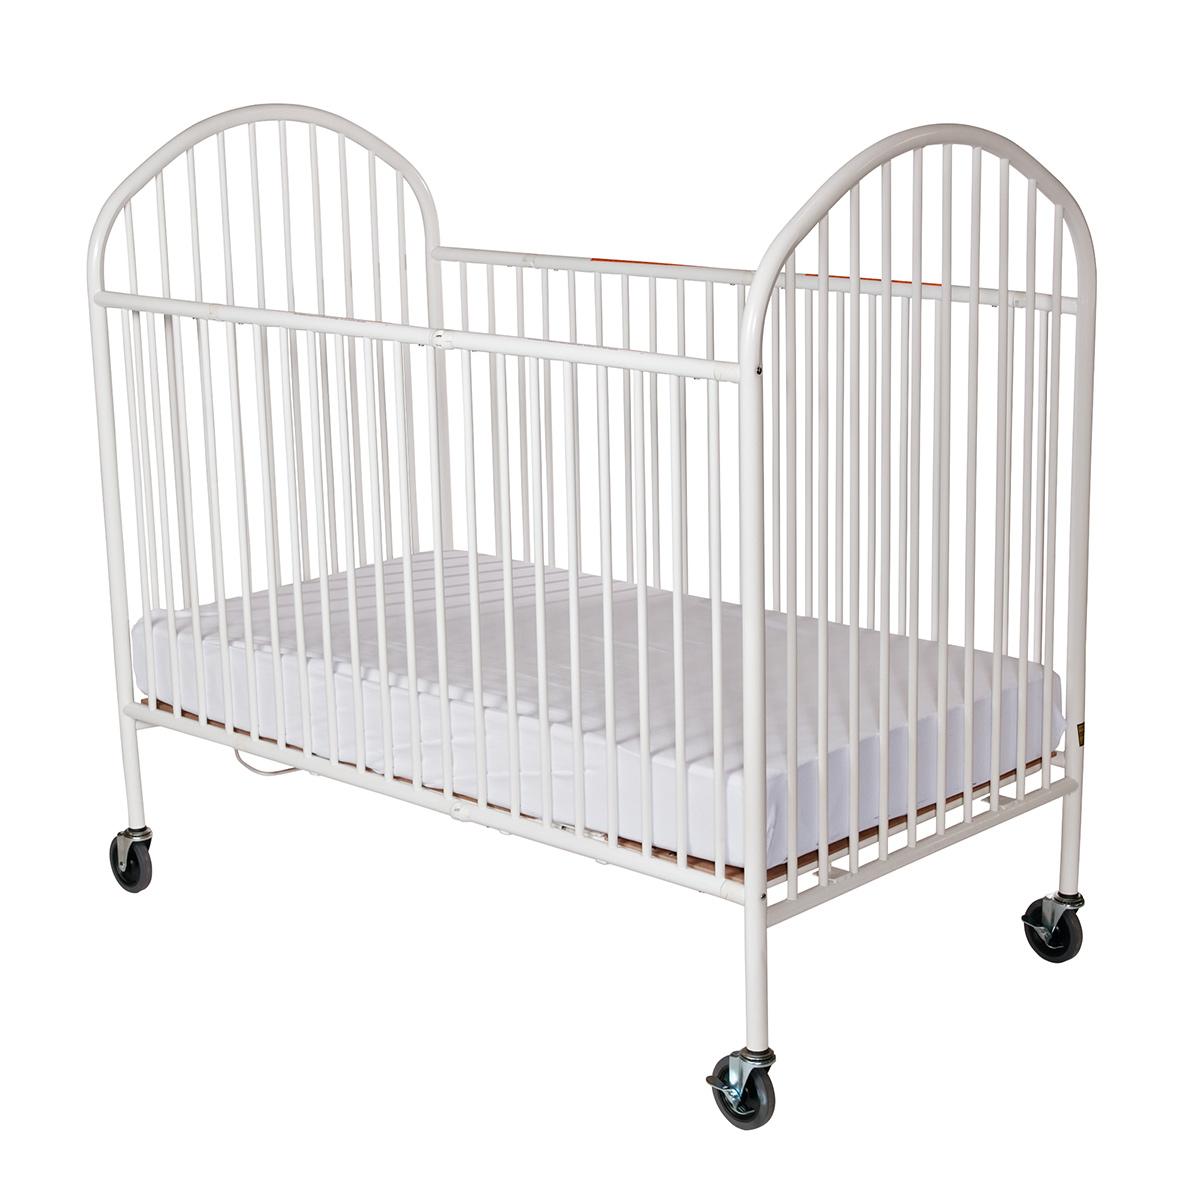 Compact Pinnacle Easyroll Folding Crib W 4 Casters